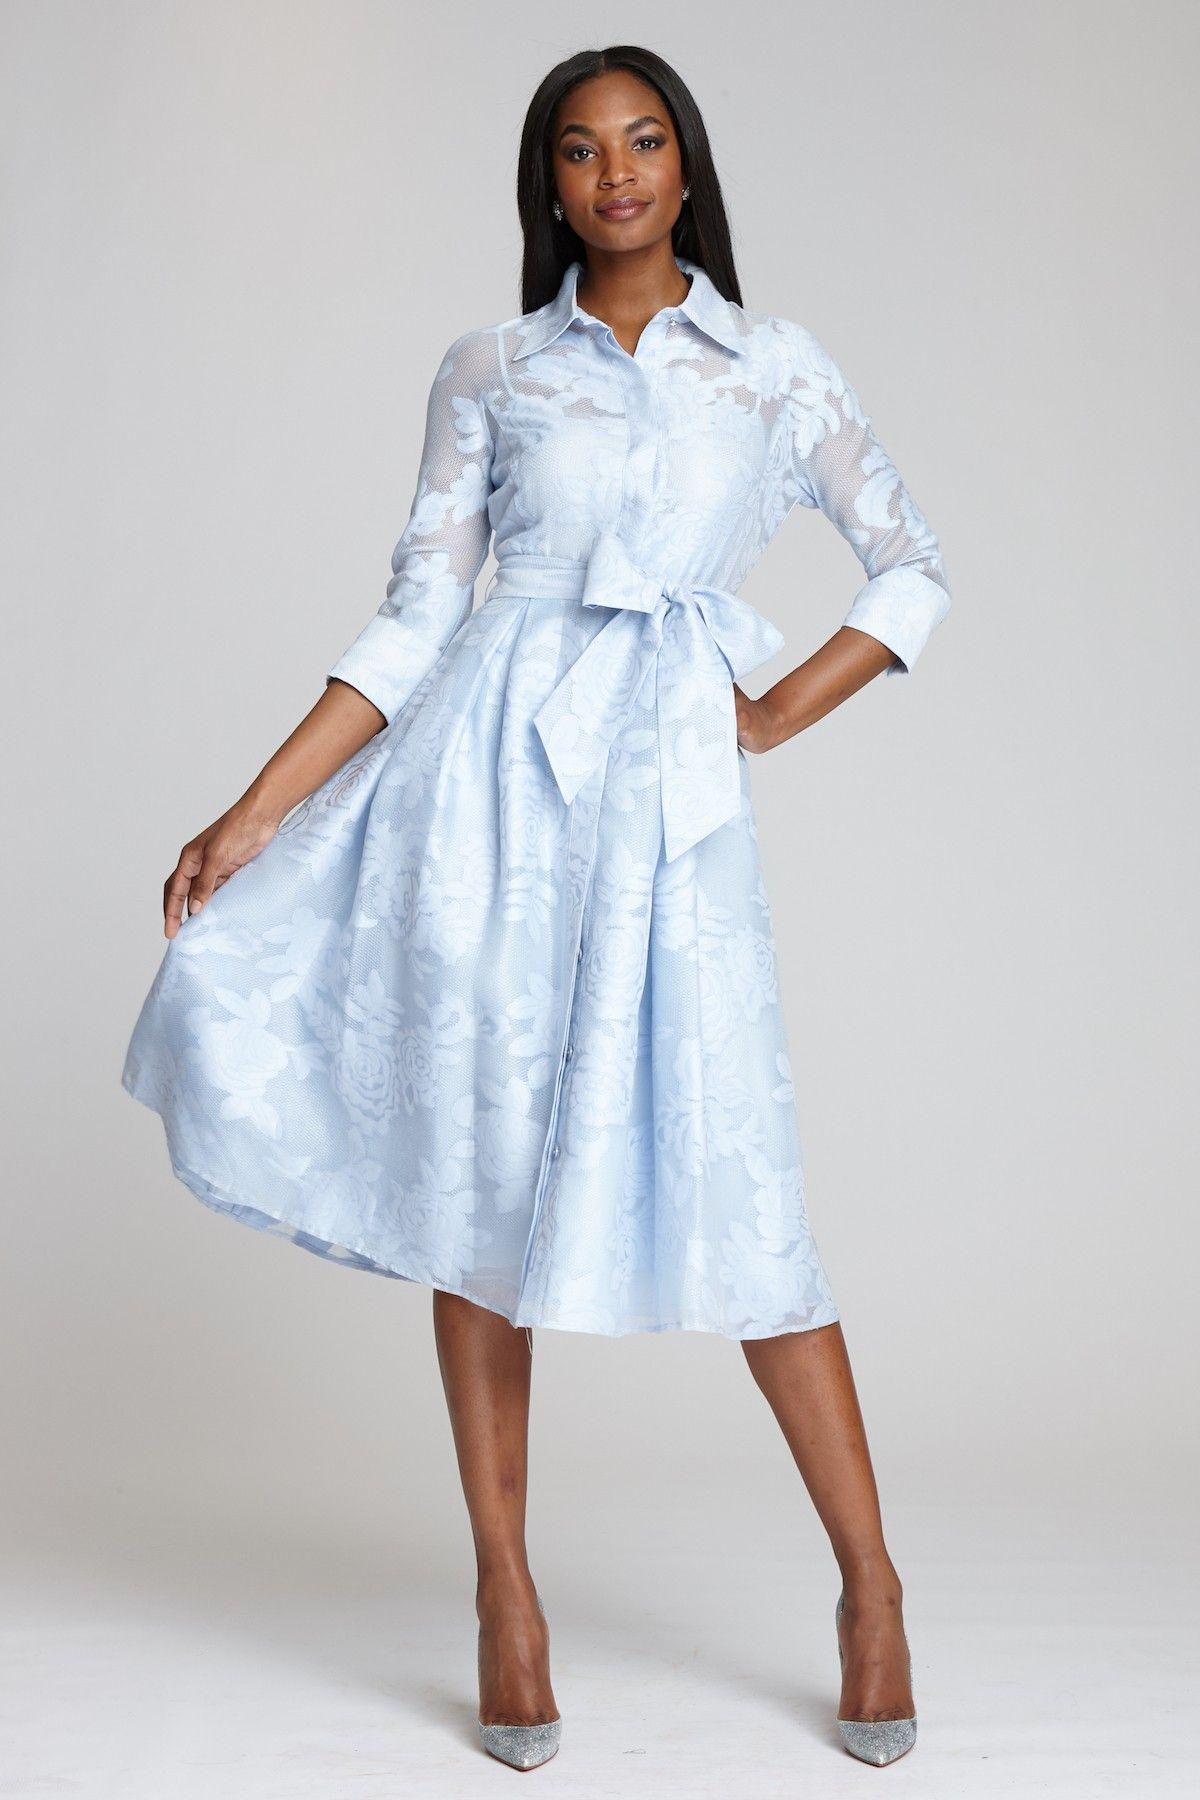 3 4 Sleeve Organza Jacquard Shirtwaist Dress Teri Jon Shirtwaist Dress Tea Length Dresses Tea Length Cocktail Dresses [ 1800 x 1200 Pixel ]